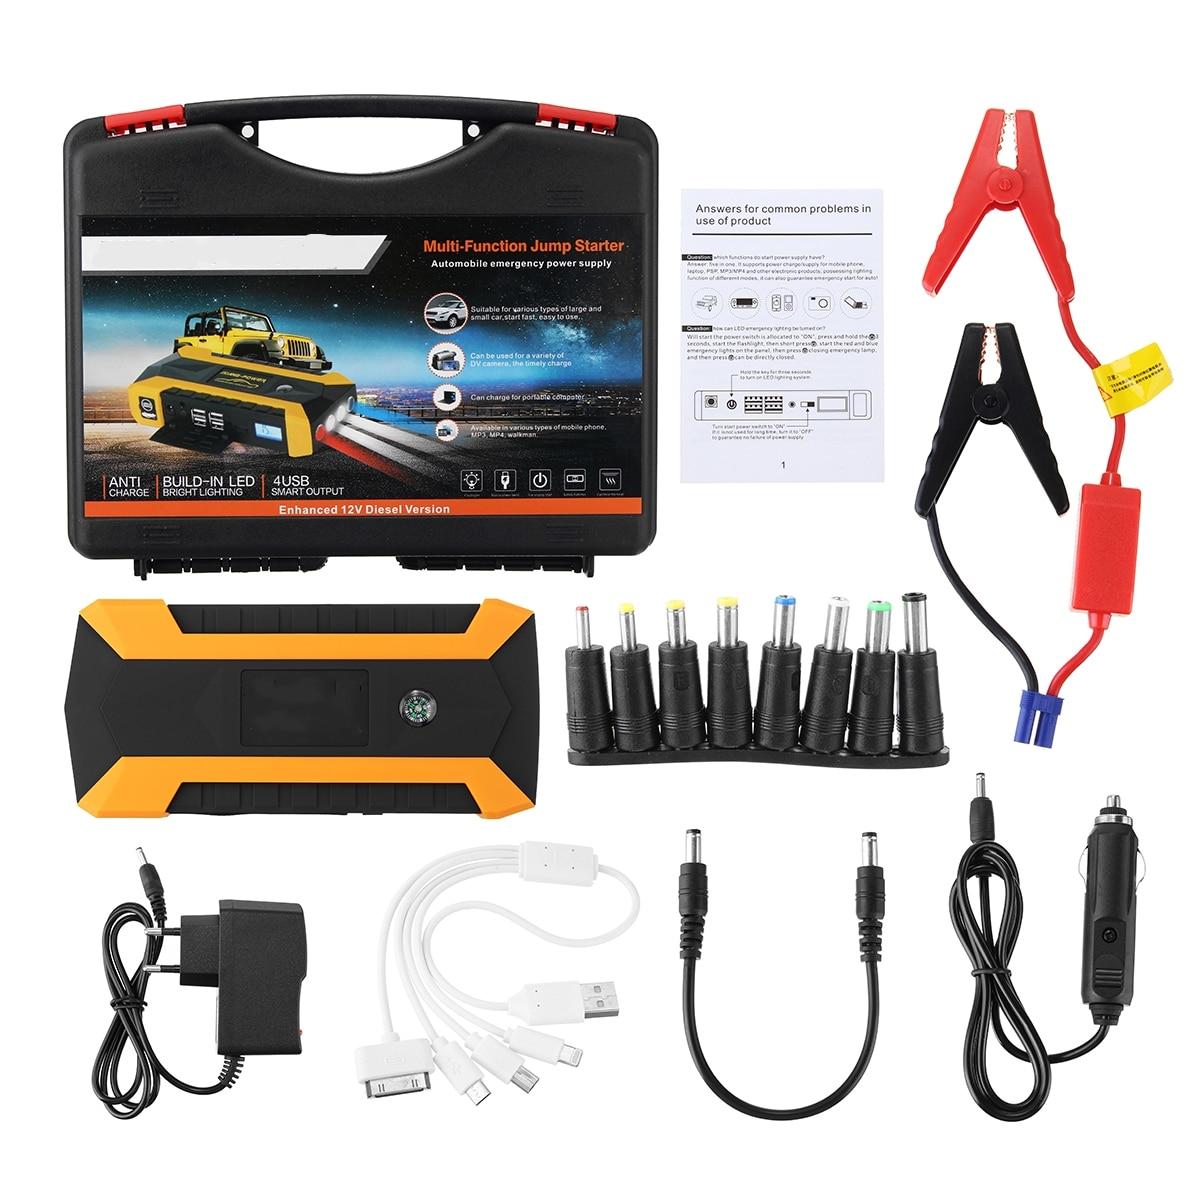 Praktische 89800 mah 12 v 4USB Auto Batterie Ladegerät Ab Auto Starthilfe Booster Power Bank Tool Kit Für Auto ausgangs Gerät